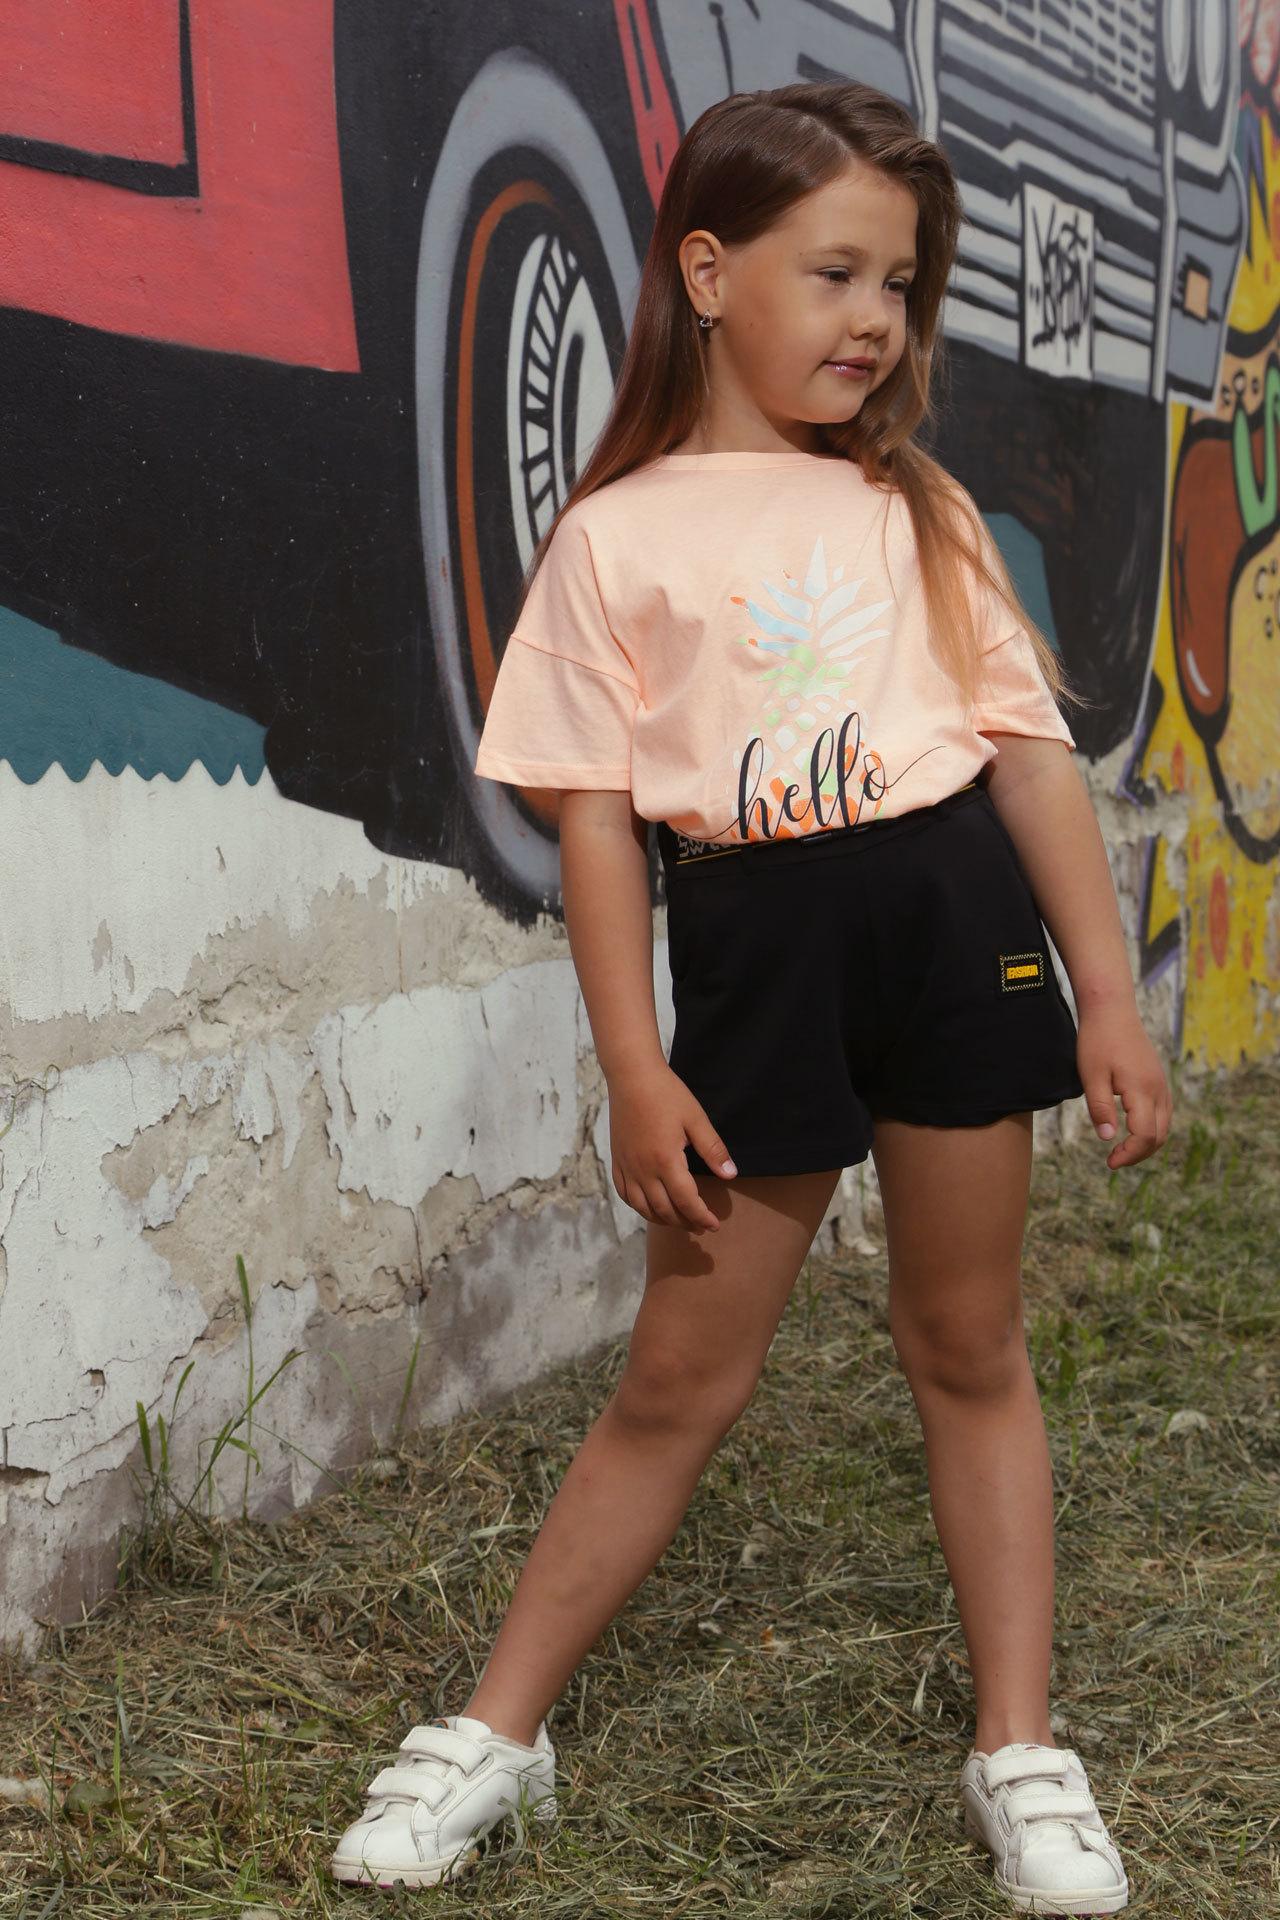 Футболка для девочки ананас Divonette Турция, 3061 (134-152)